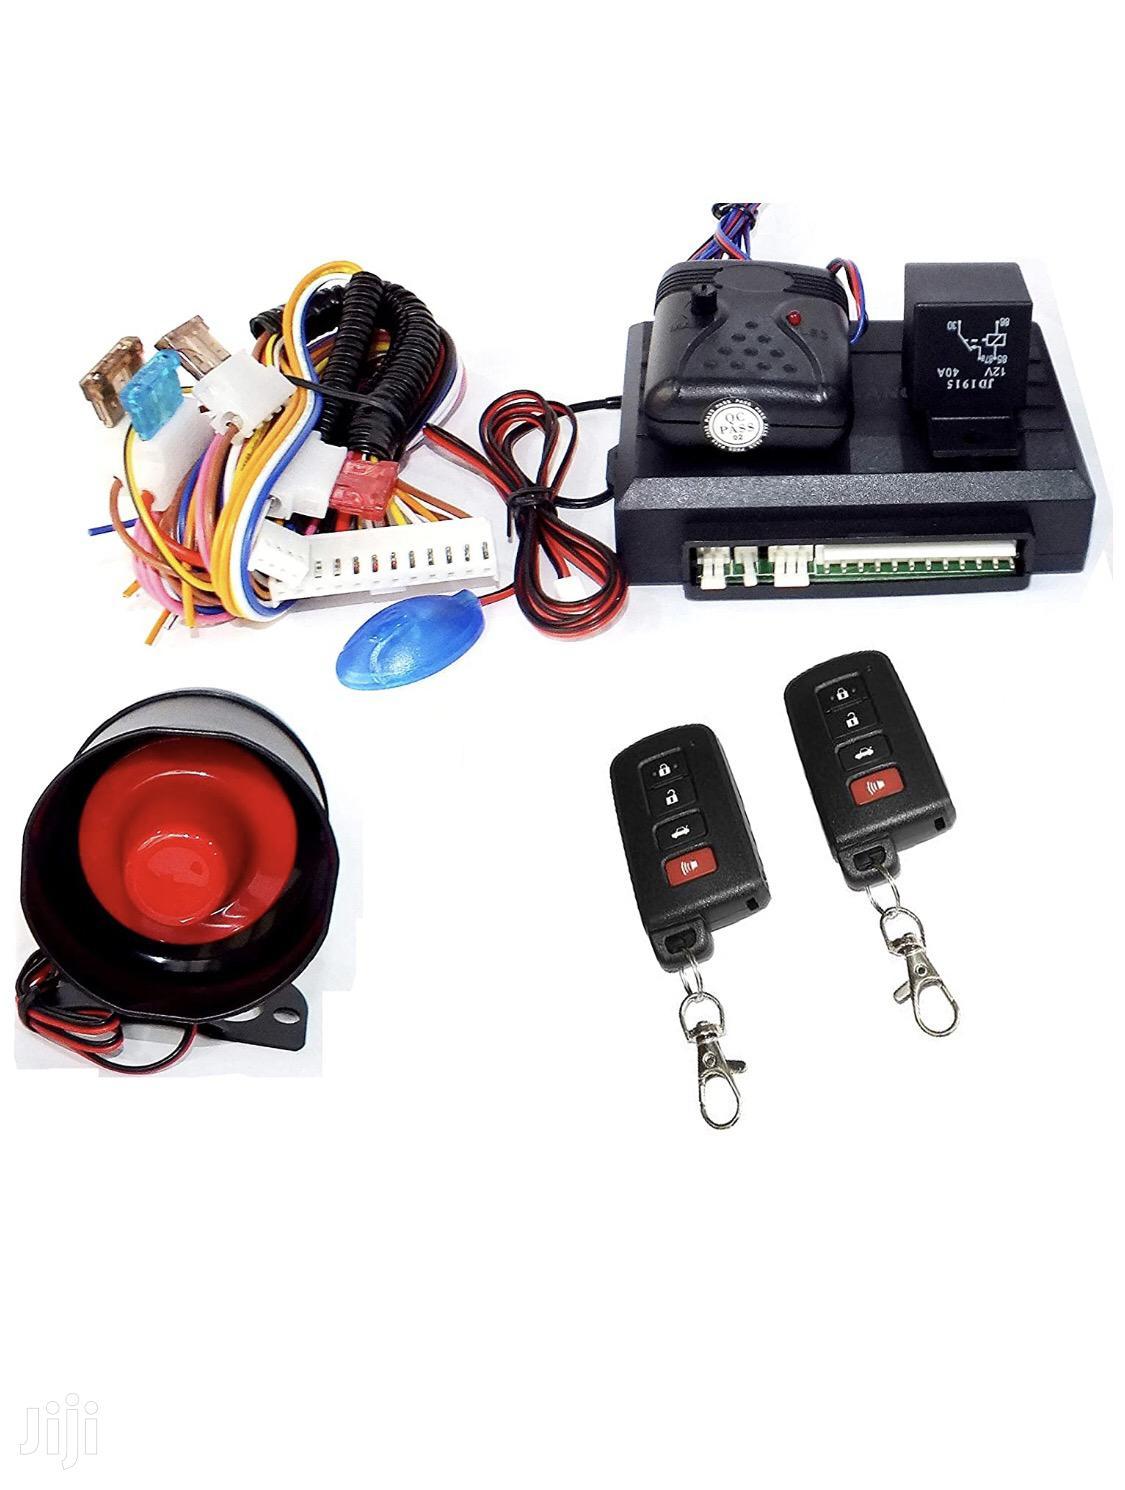 Universal Car Alarm Systems With O2 Remote Control Keys